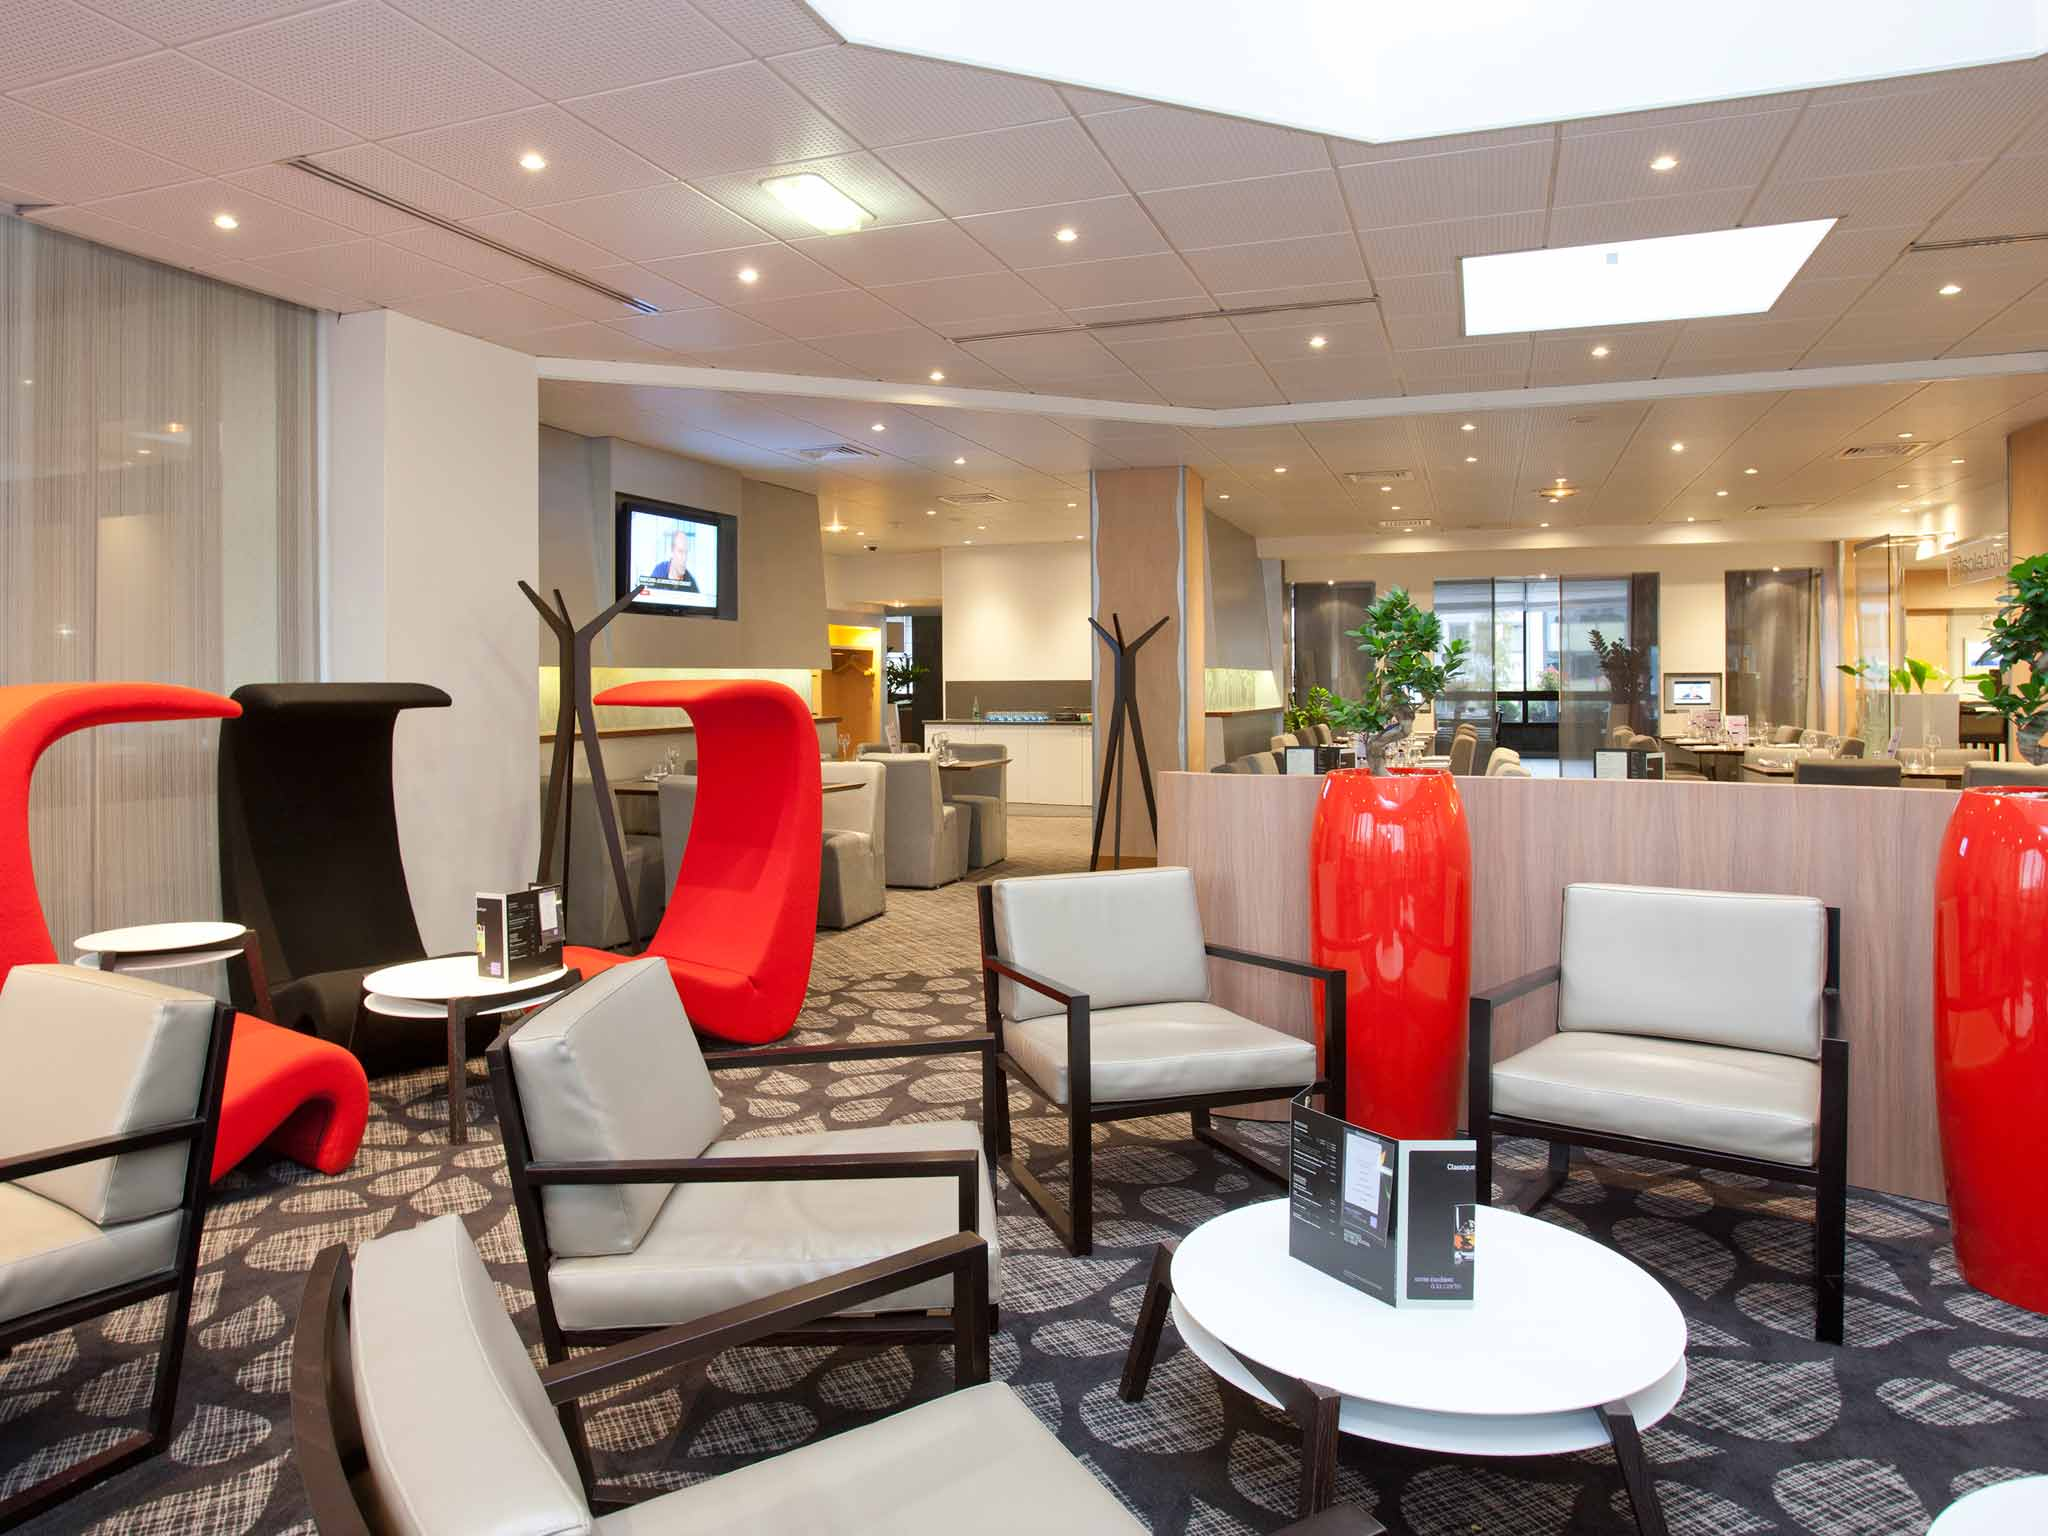 Hotell – Novotel Lyon Centre Part-Dieu